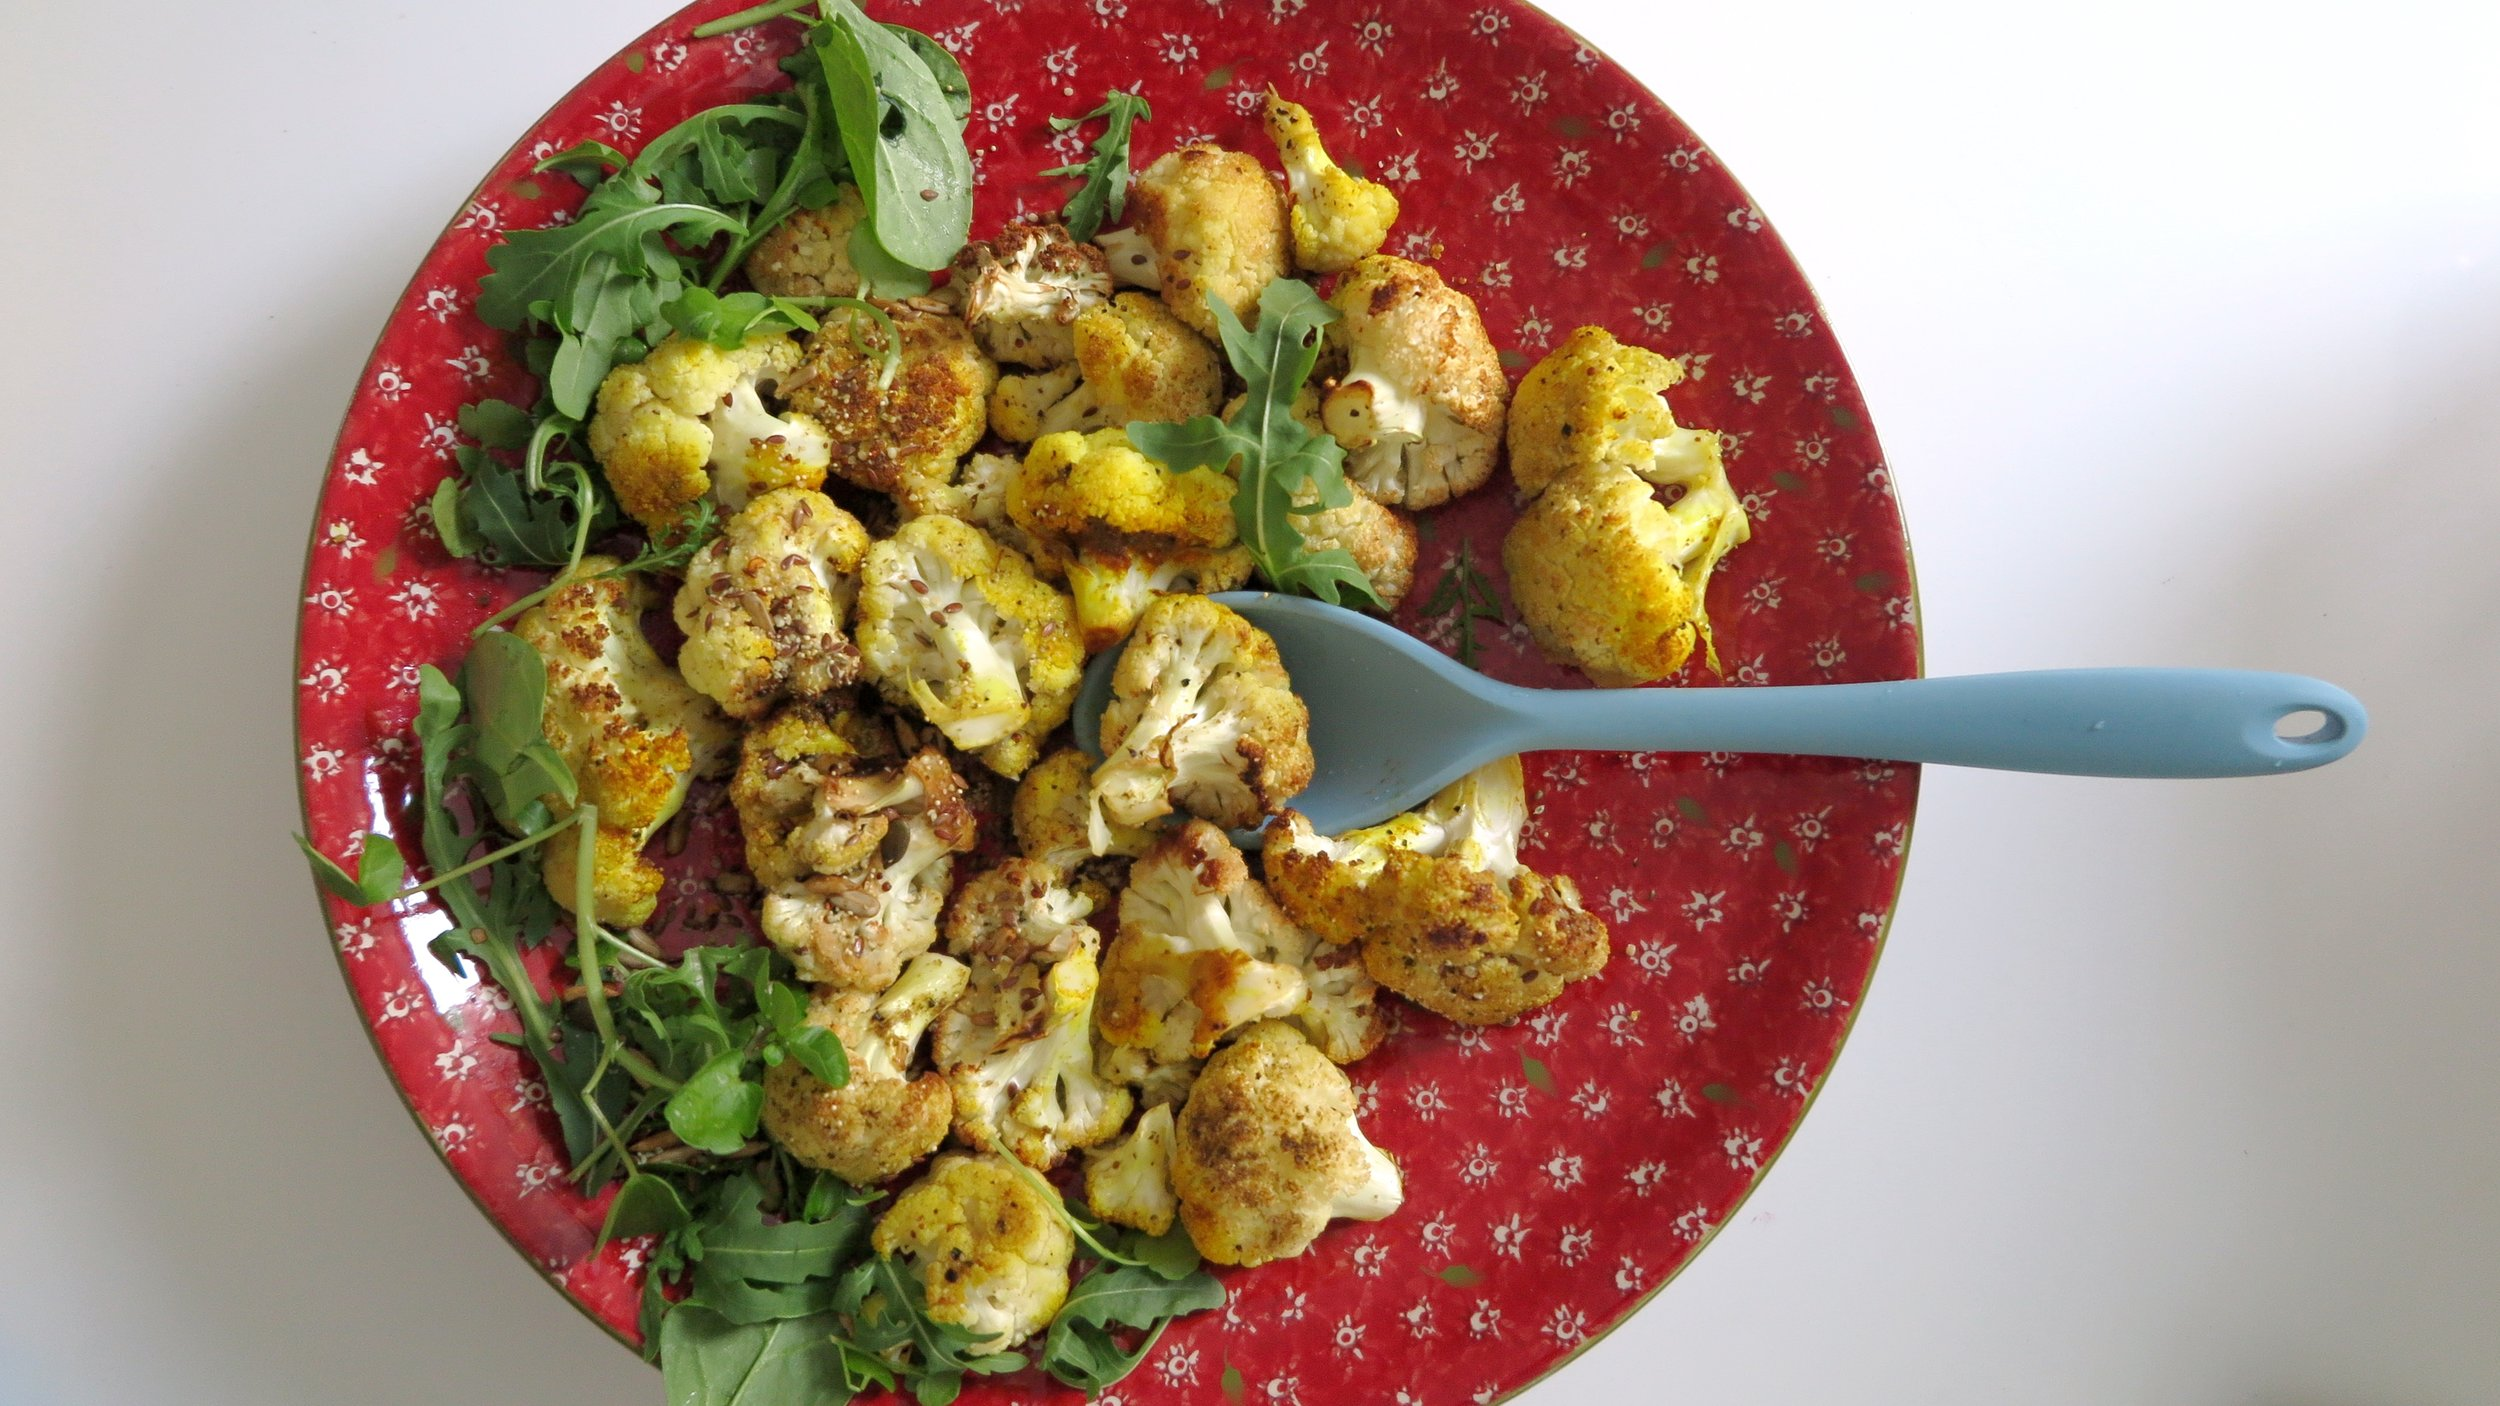 Yummy turmeric roasted cauliflower recipe